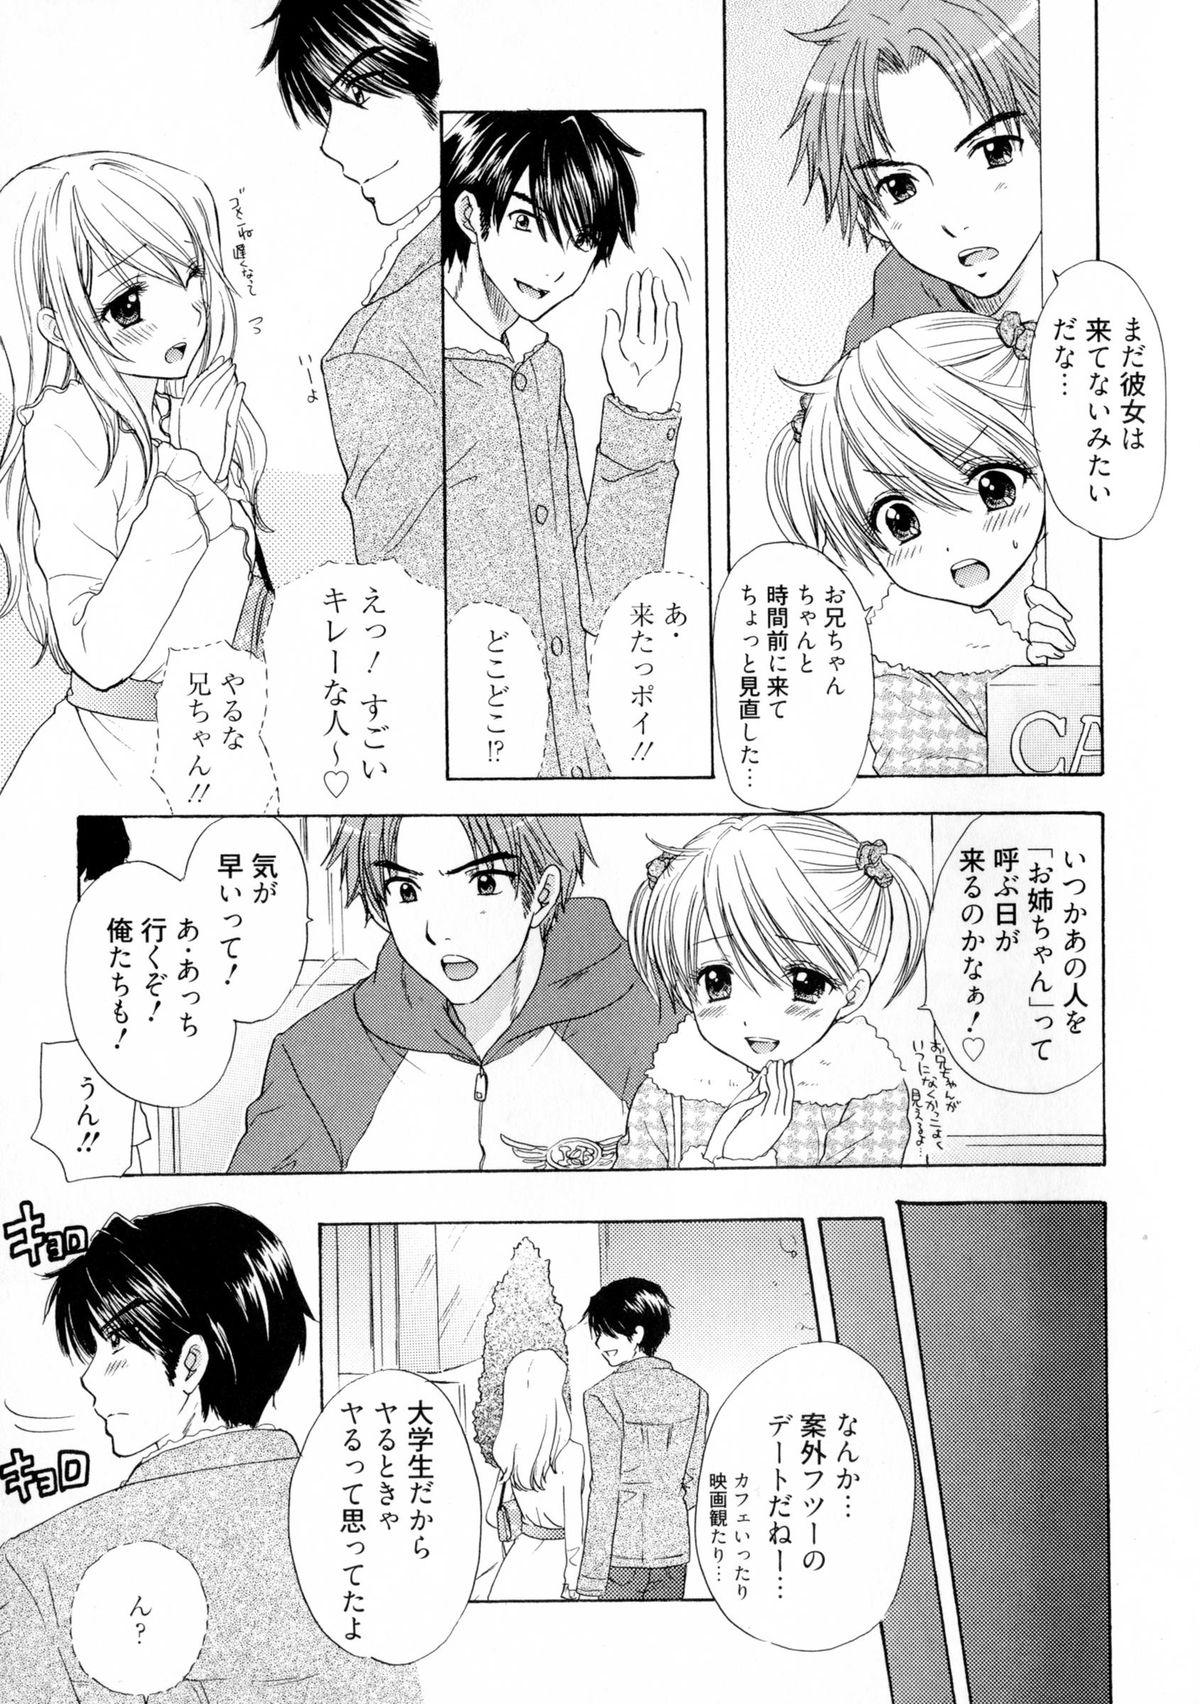 The Great Escape 4 Shokai Genteiban 22